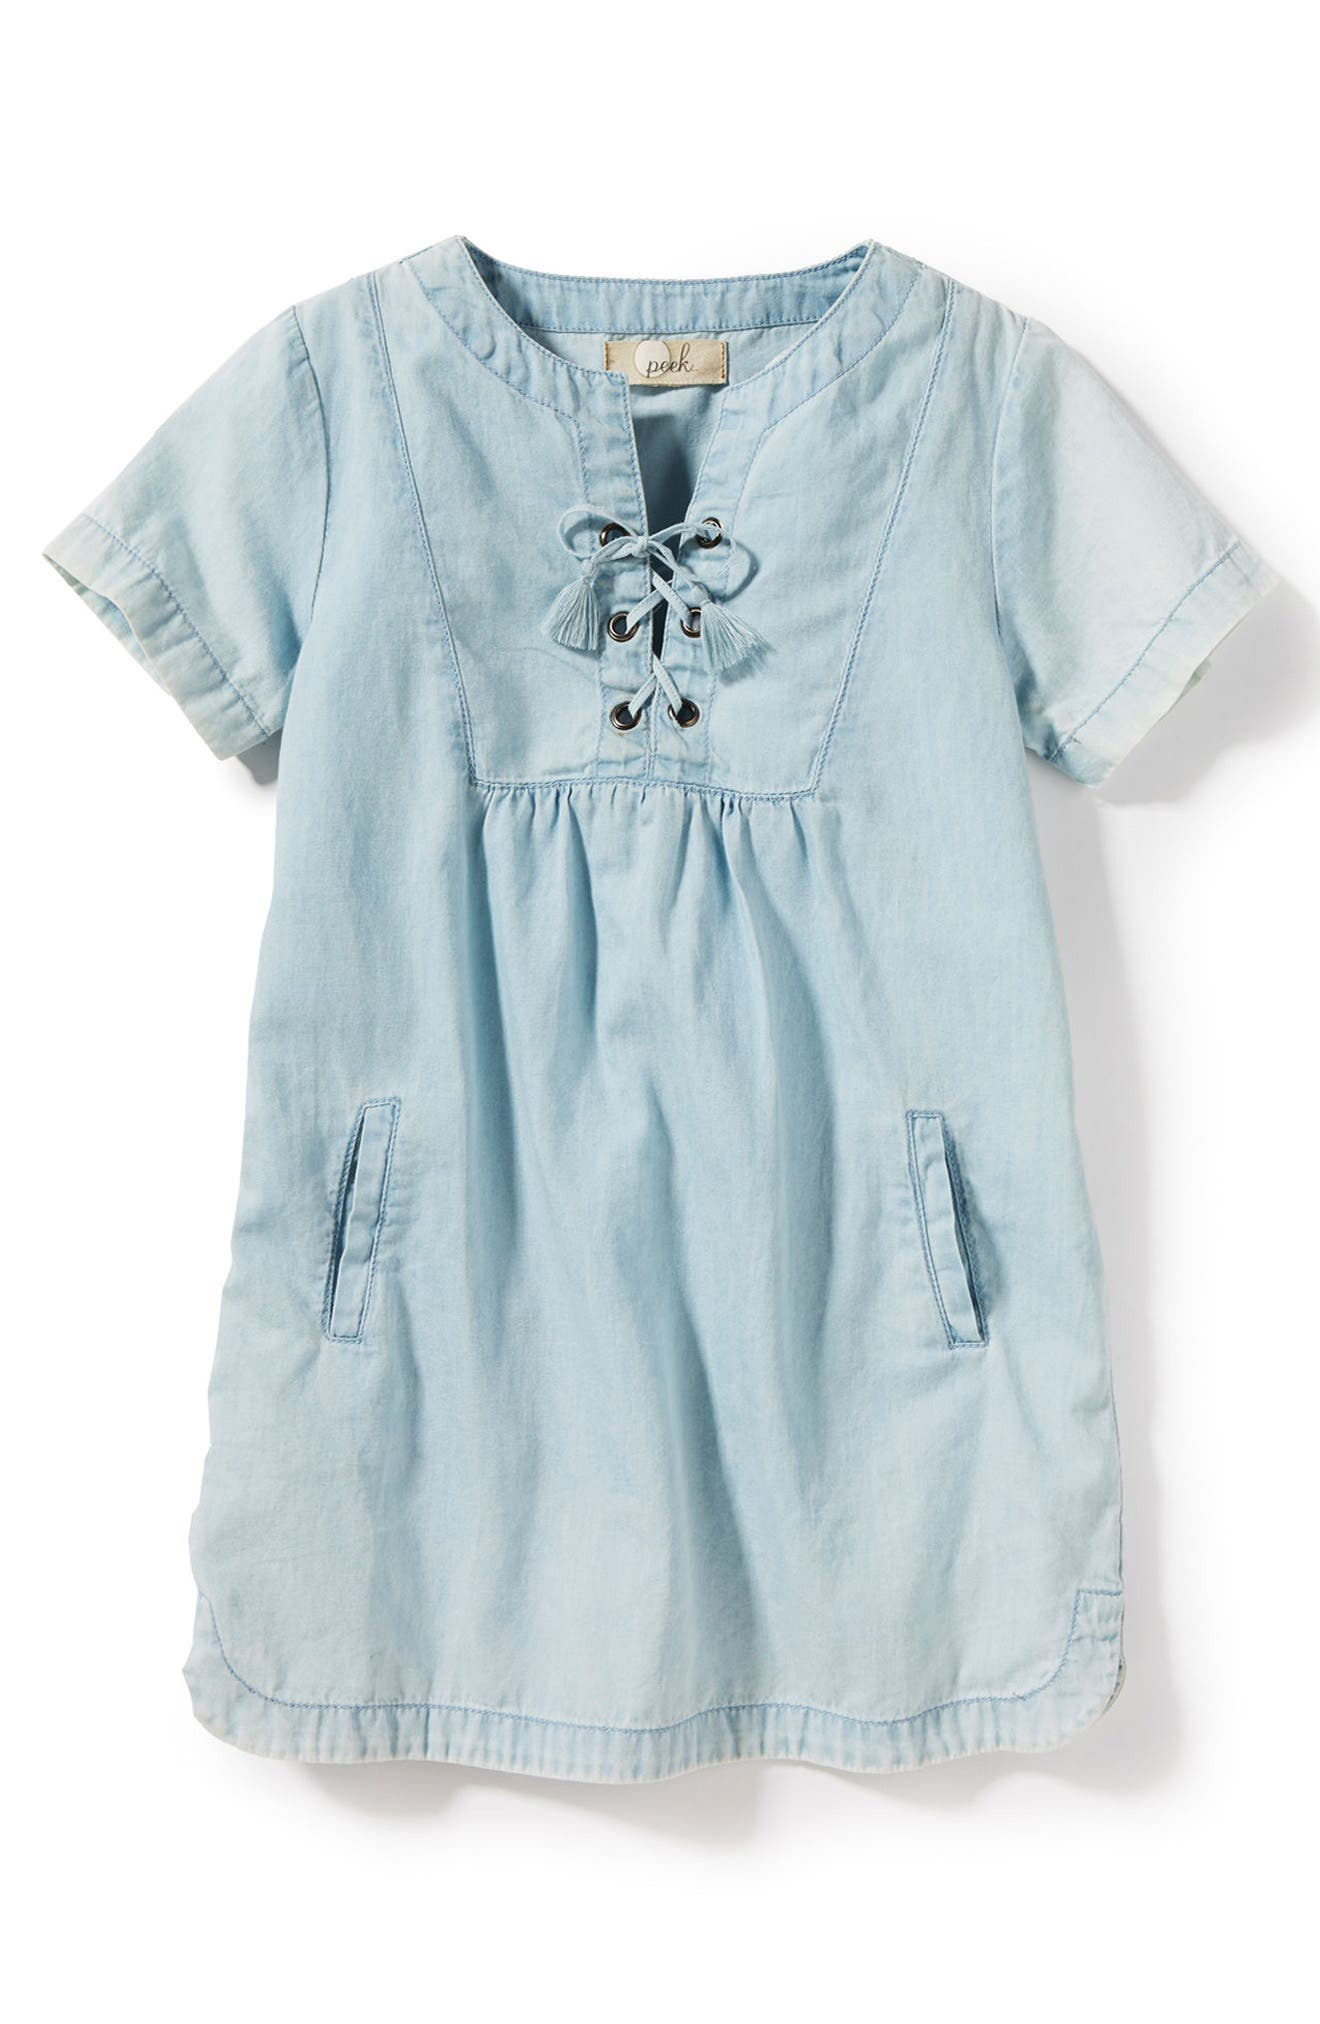 Malibu Chambray Dress,                             Main thumbnail 1, color,                             Bleach